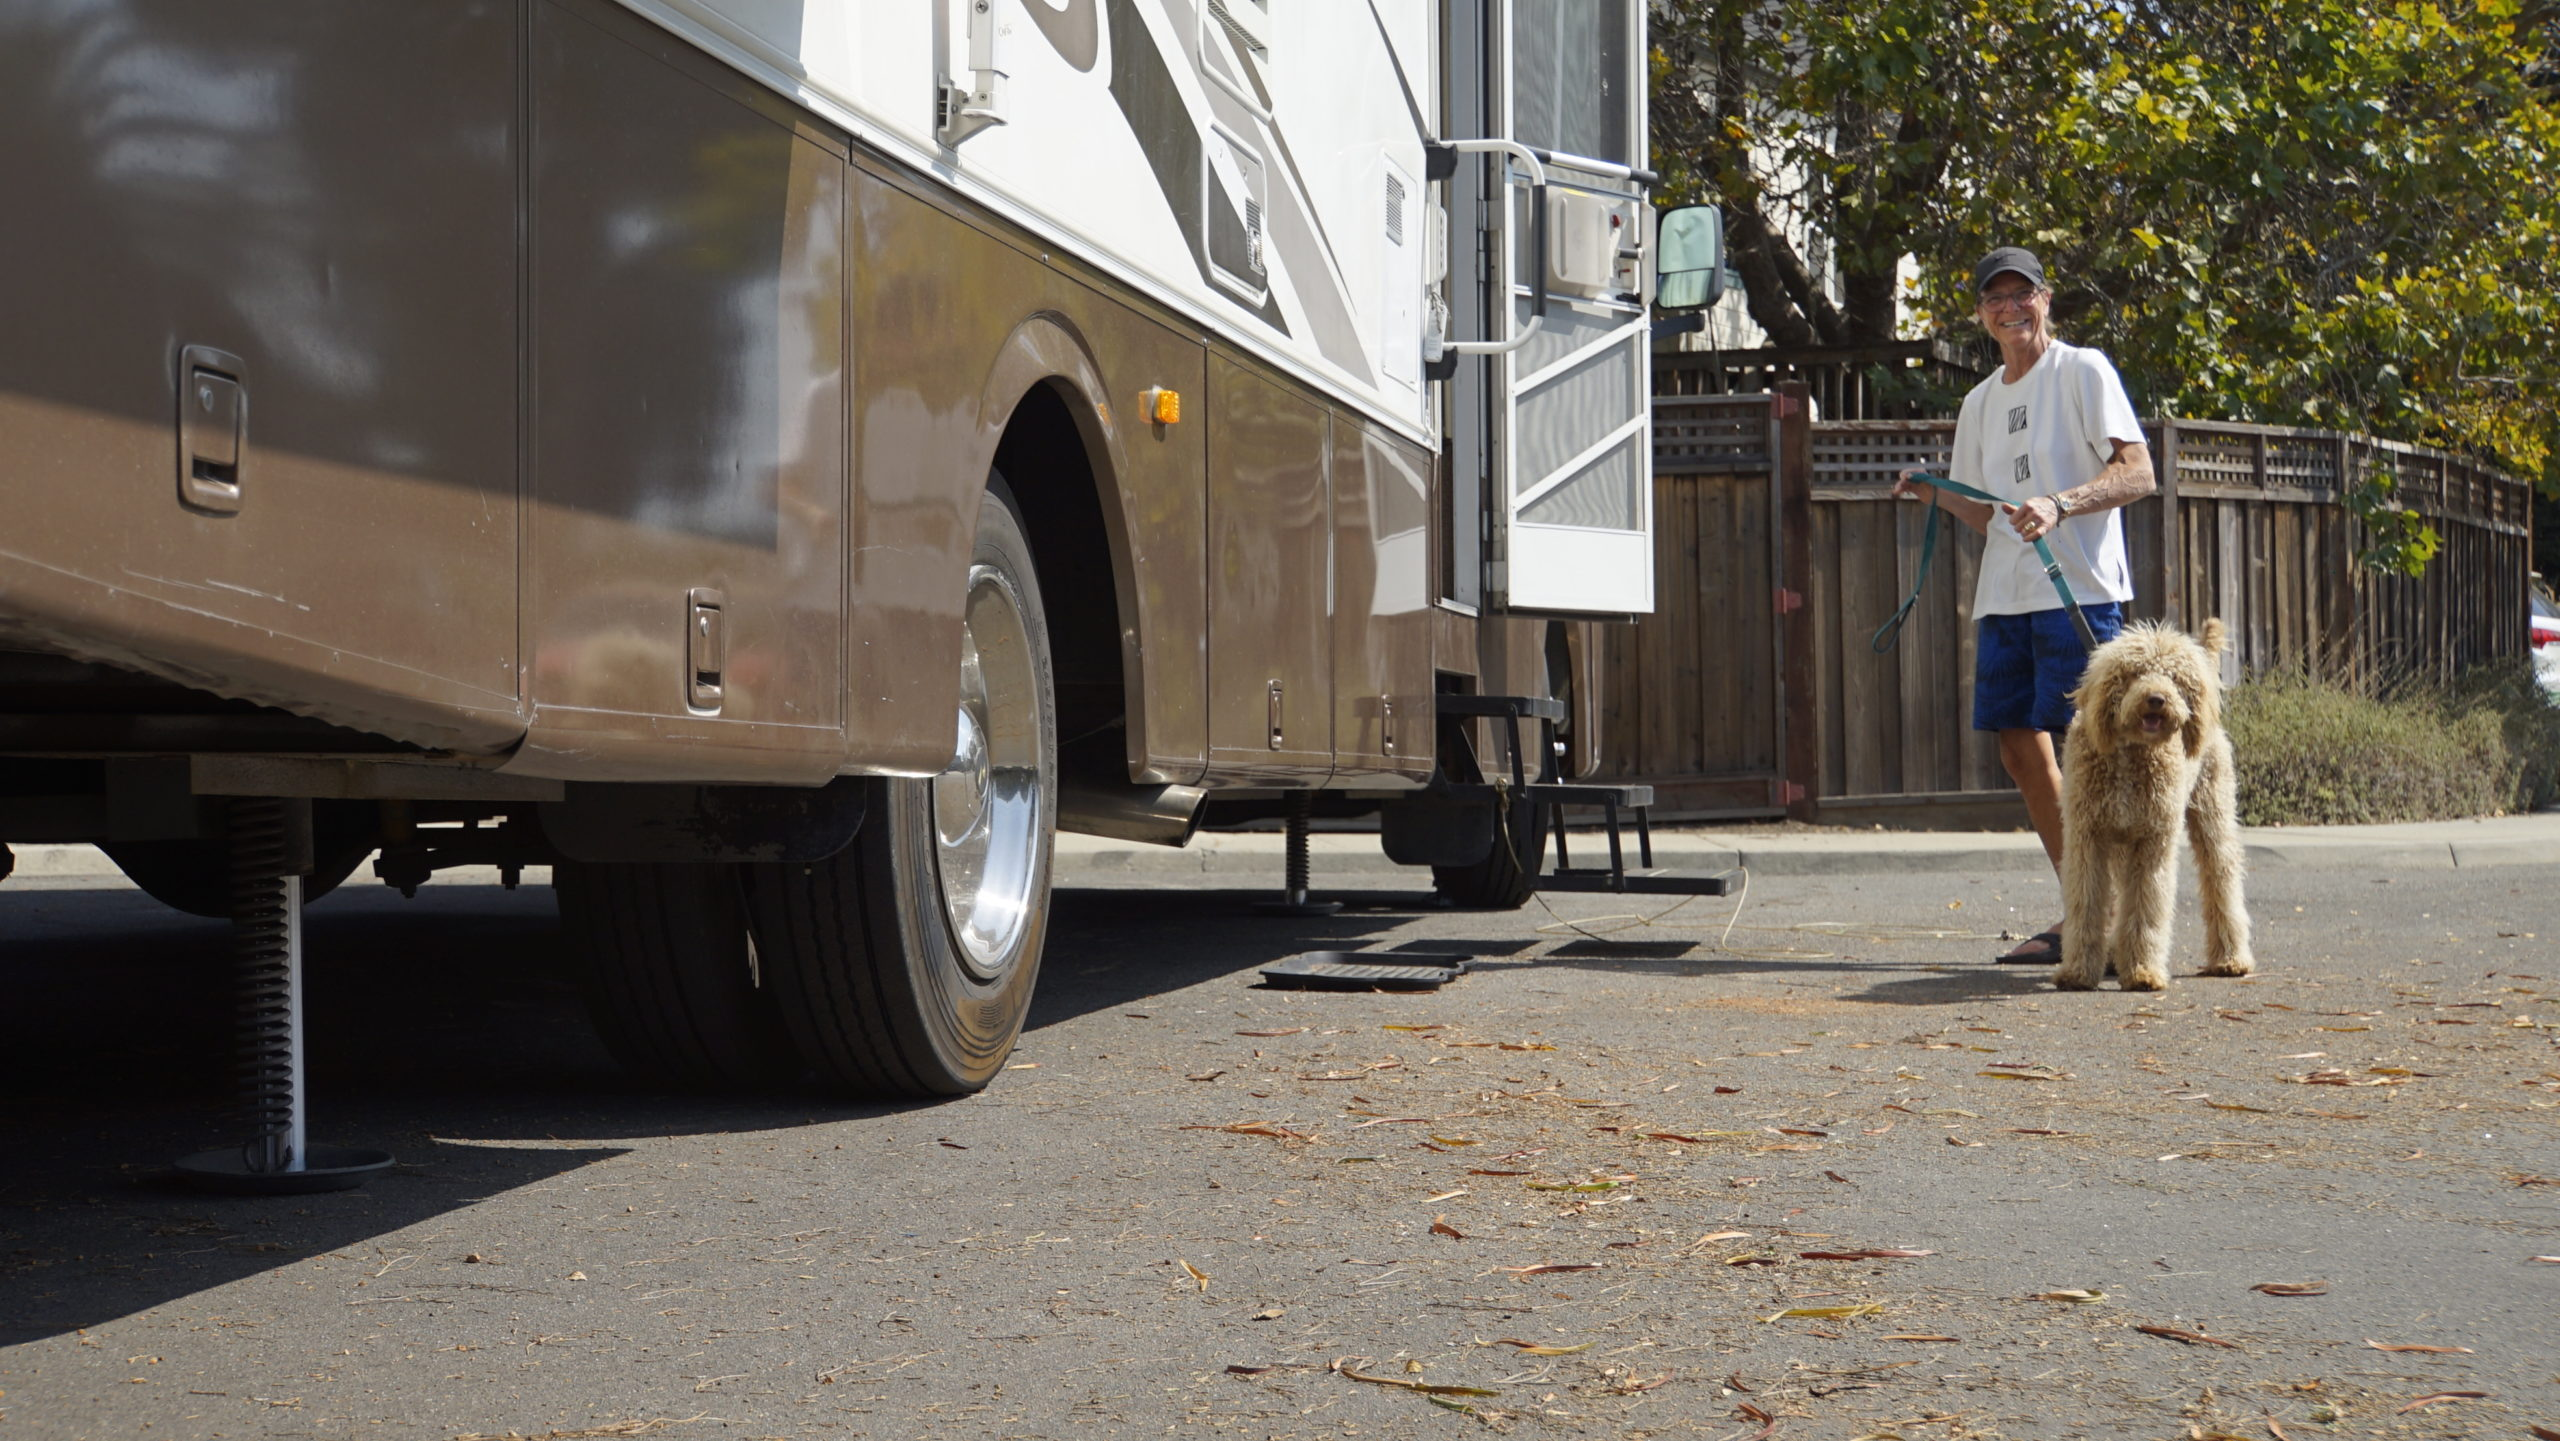 Jana Monson stands by her RV in Santa Cruz